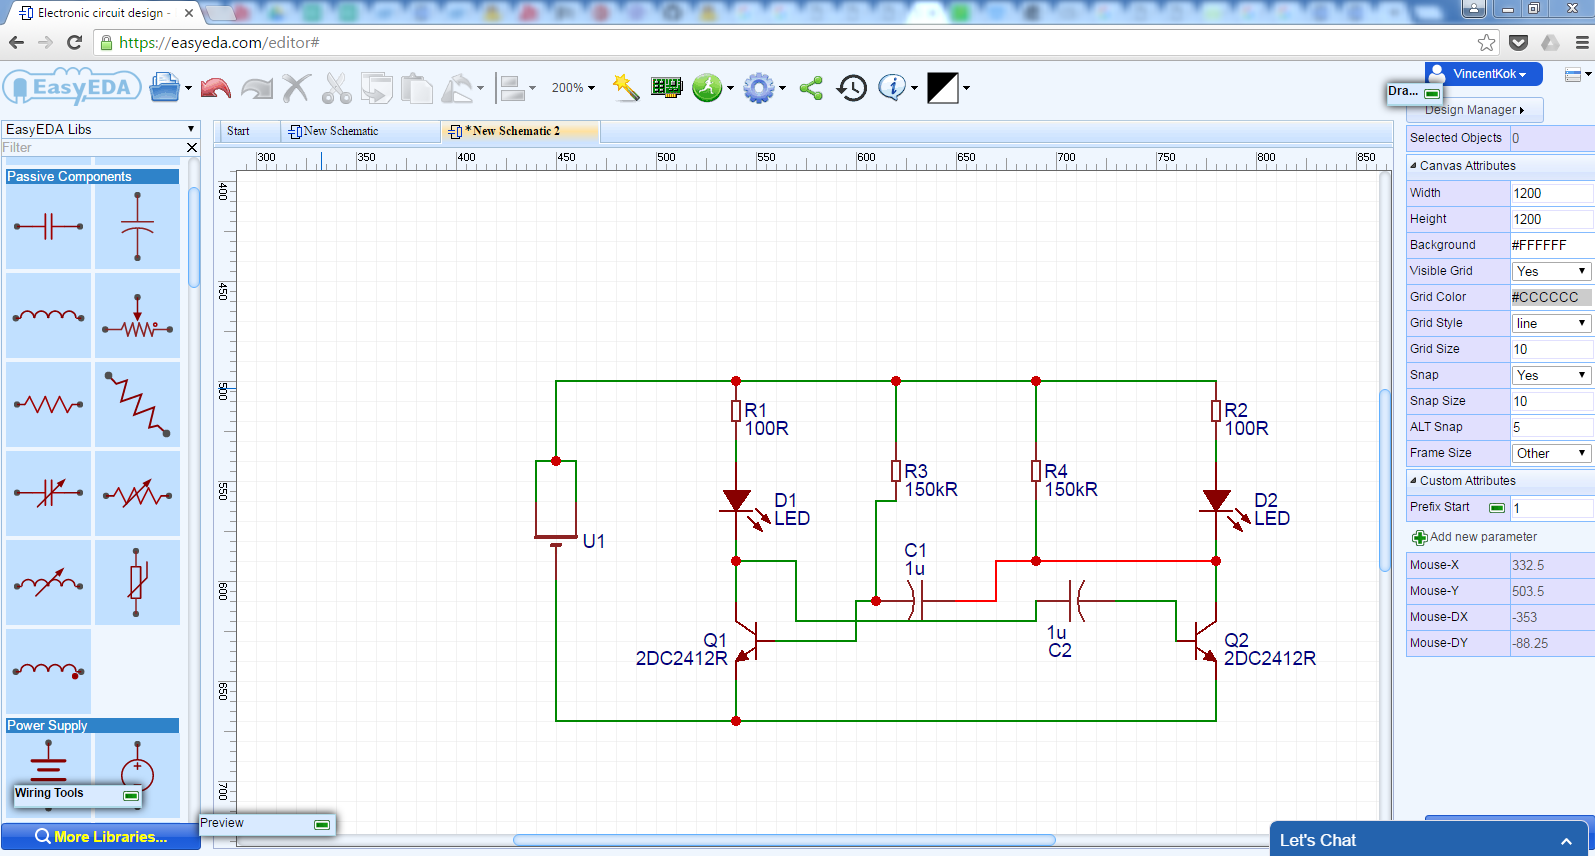 Vinctronics: Review of EasyEDA Design Software